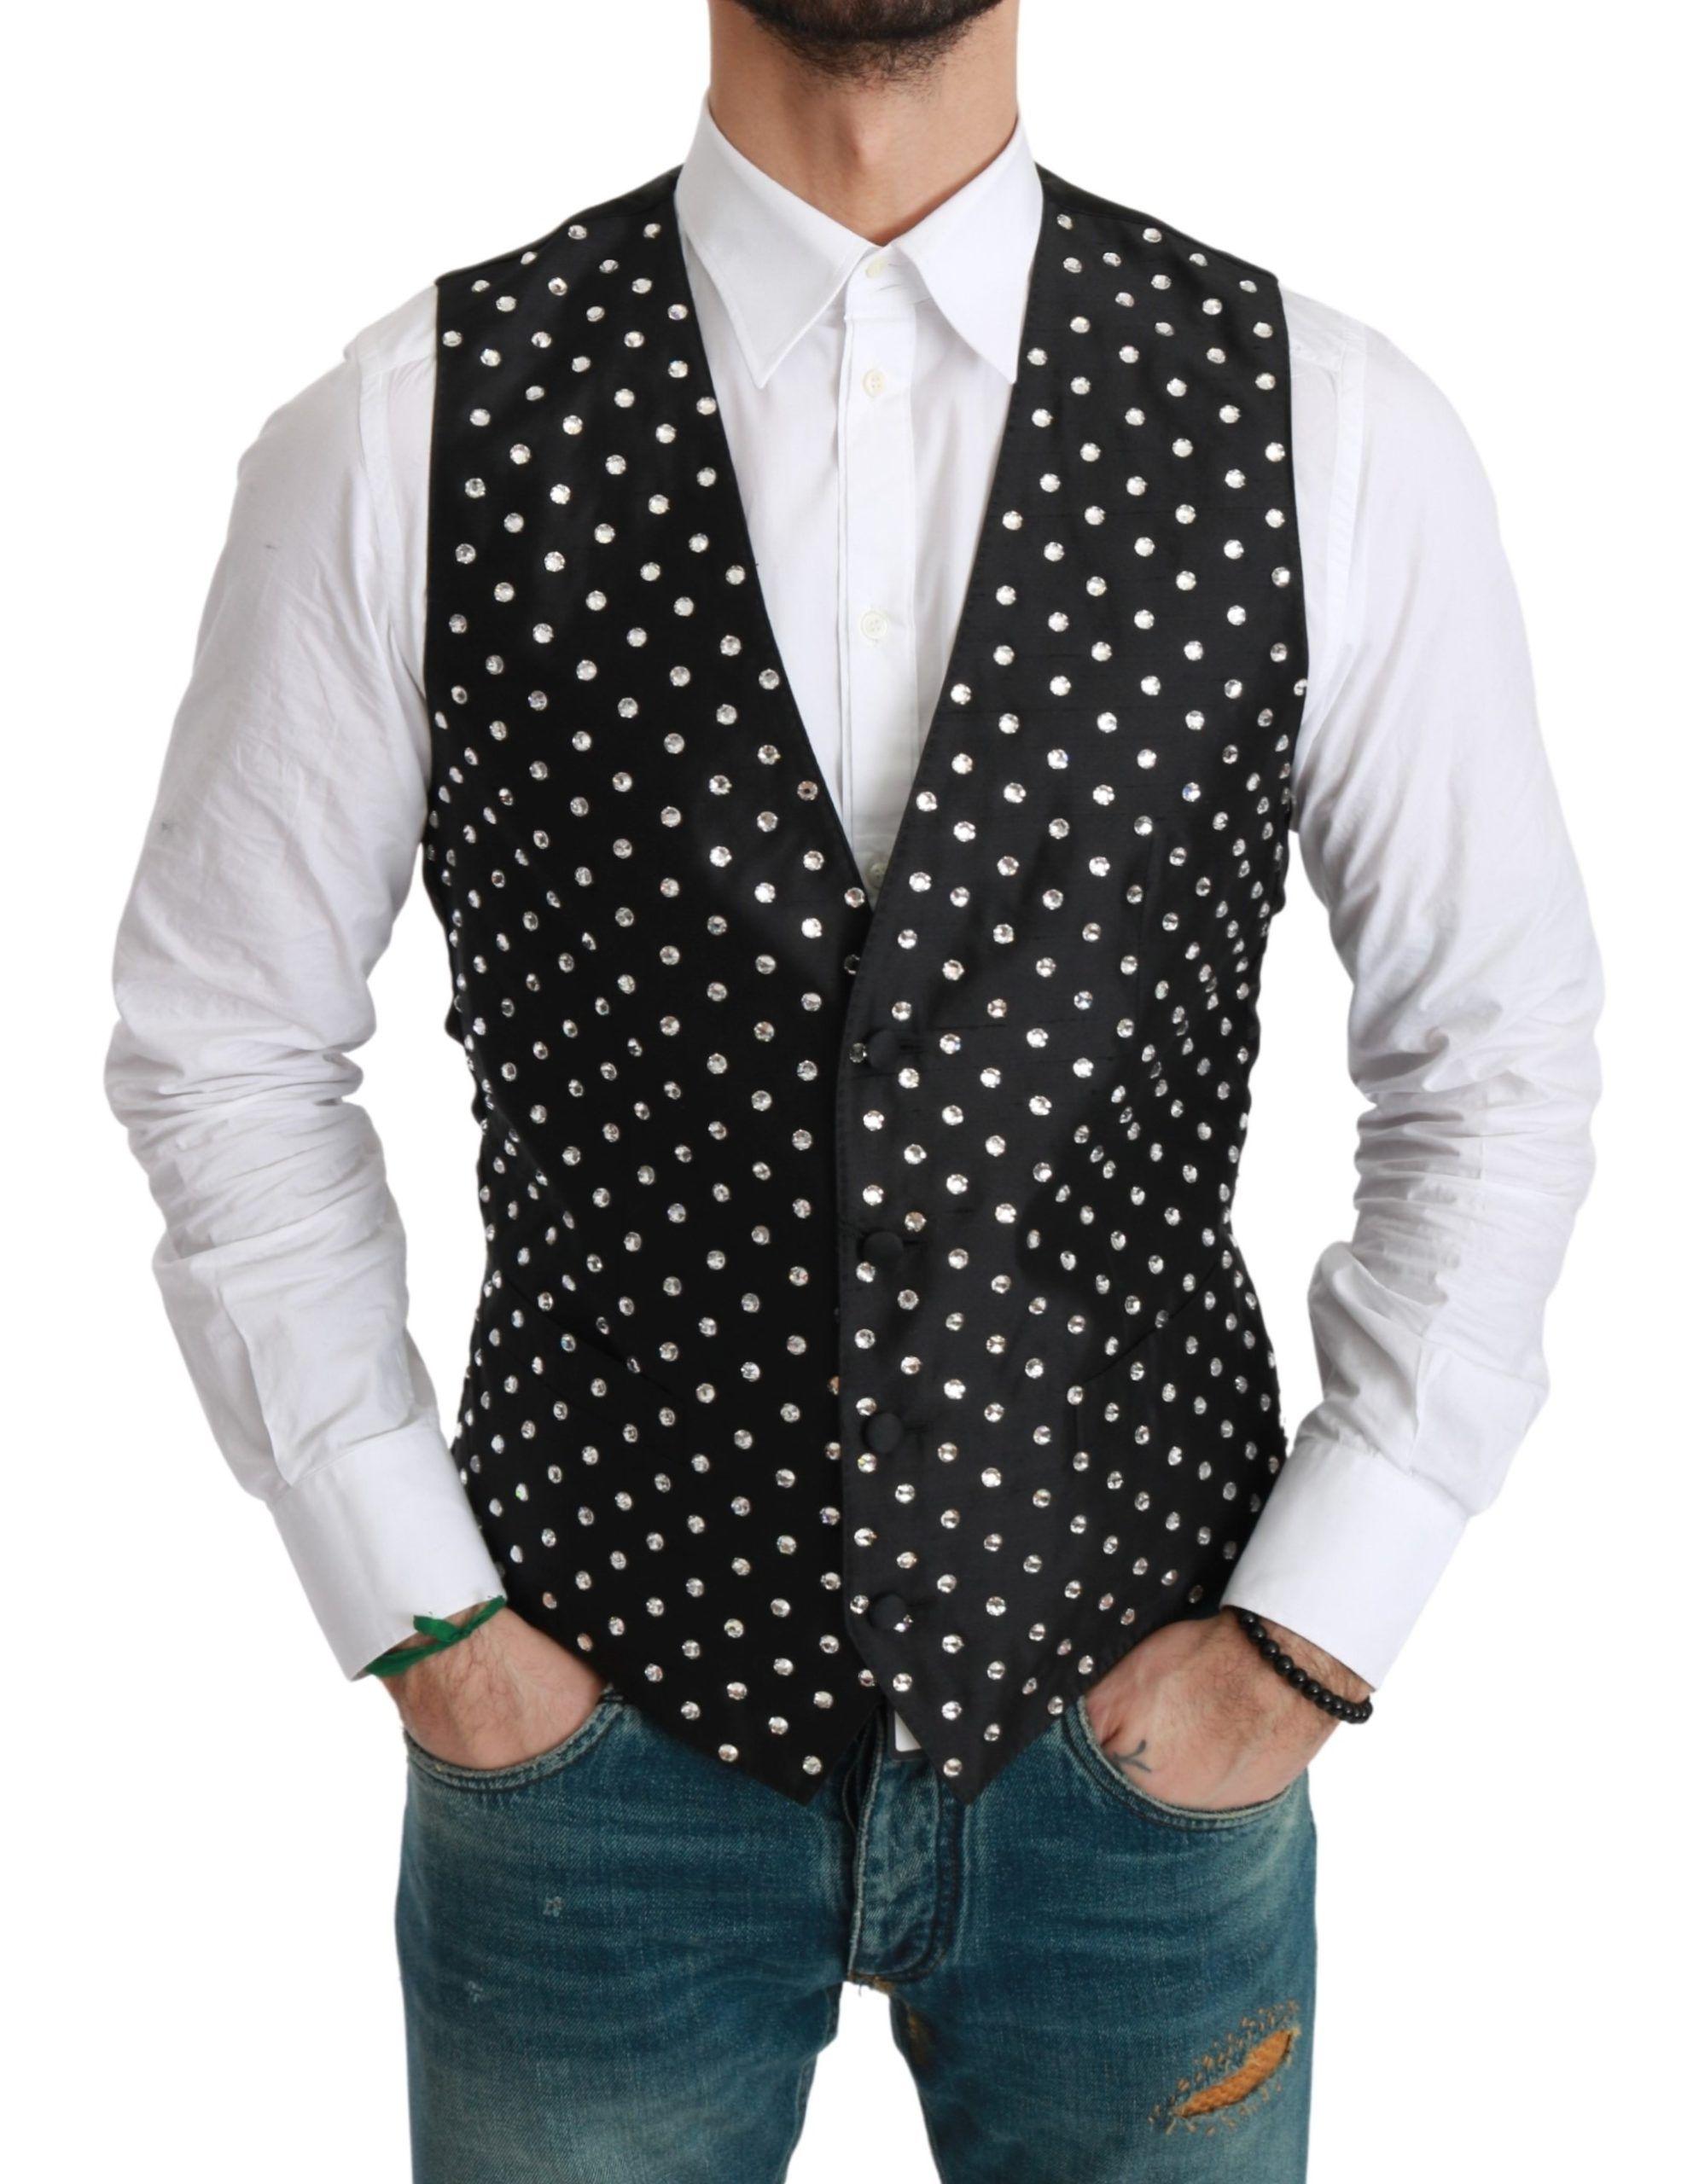 Dolce & Gabbana Black Crystal Waistcoat Formal Silk Vest